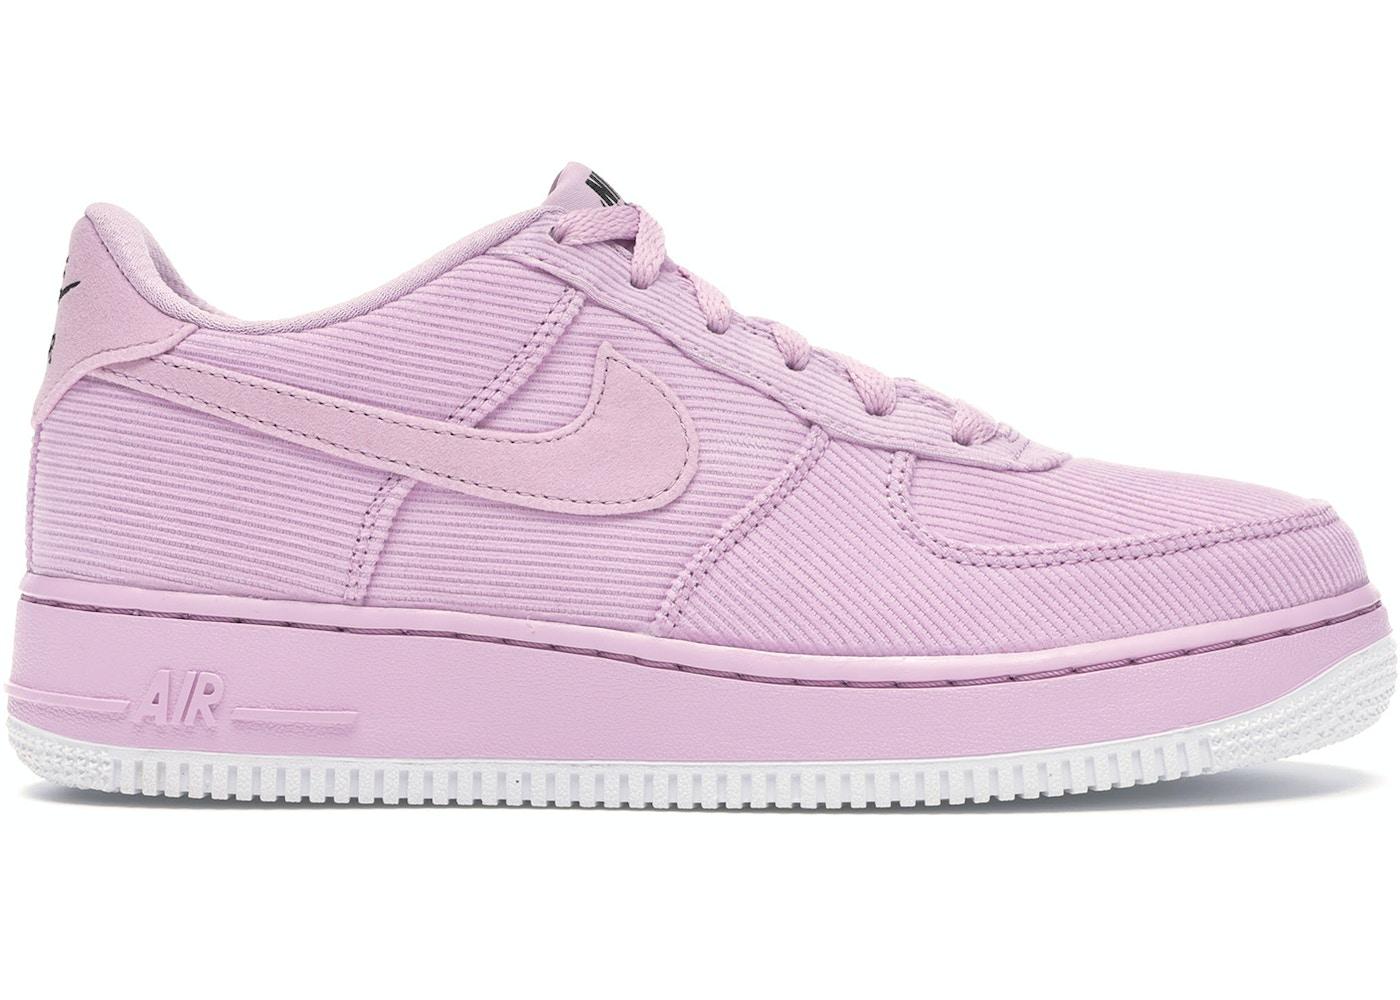 Nike Air Force 1 Lv8 Light Arctic Pink Gs Ar0736 600